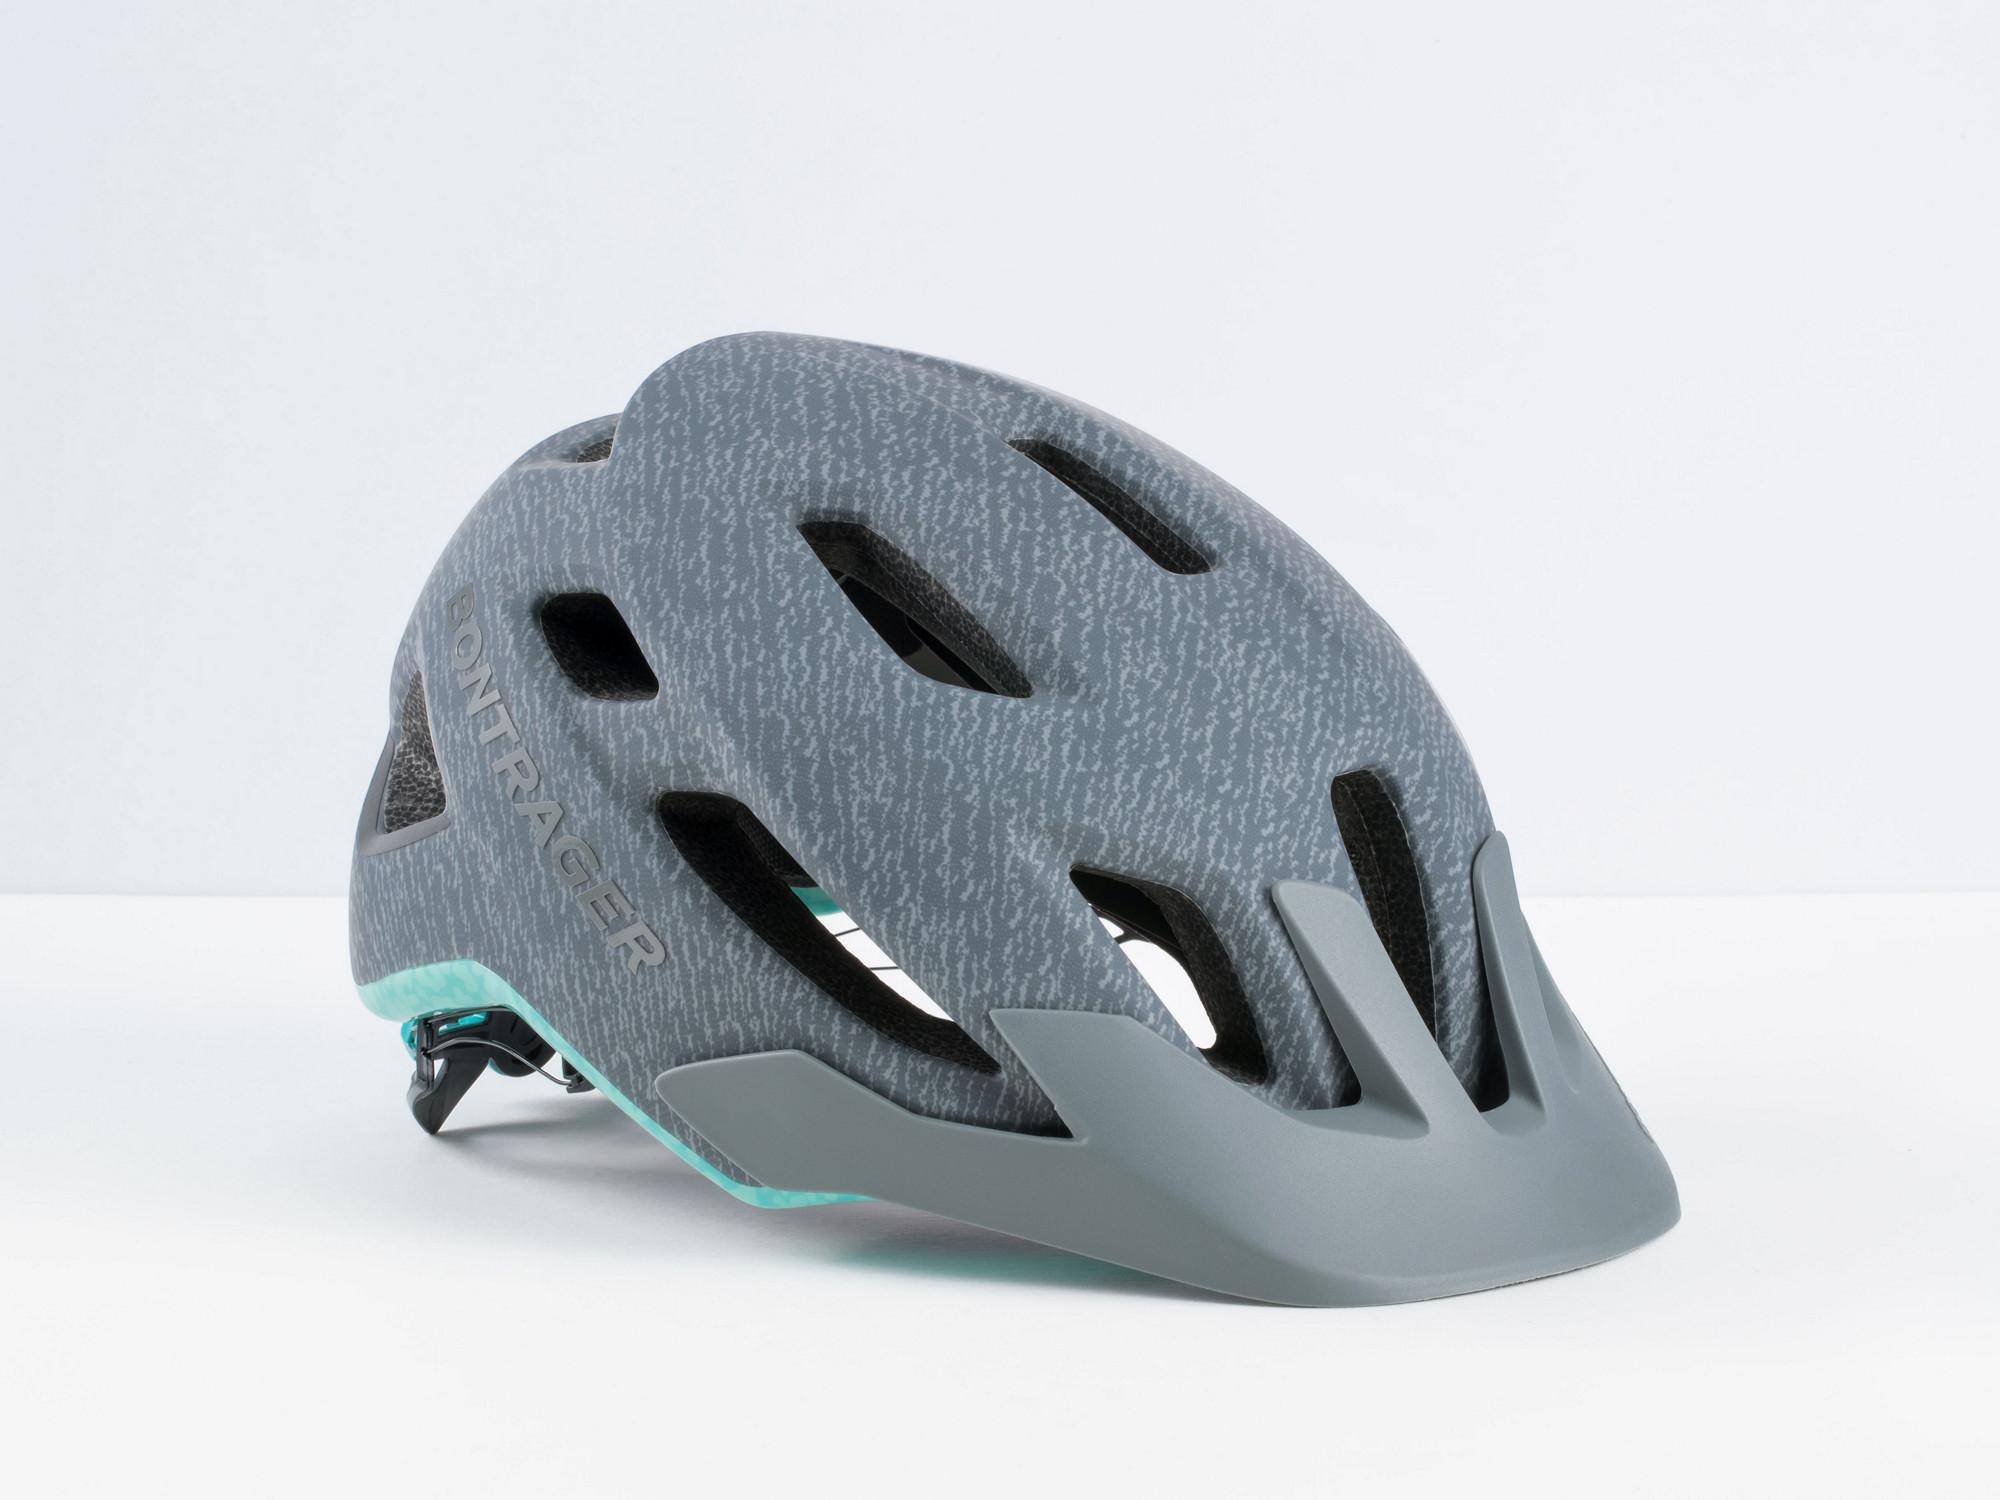 bontrager quantum mips bike helmet recreational. Black Bedroom Furniture Sets. Home Design Ideas